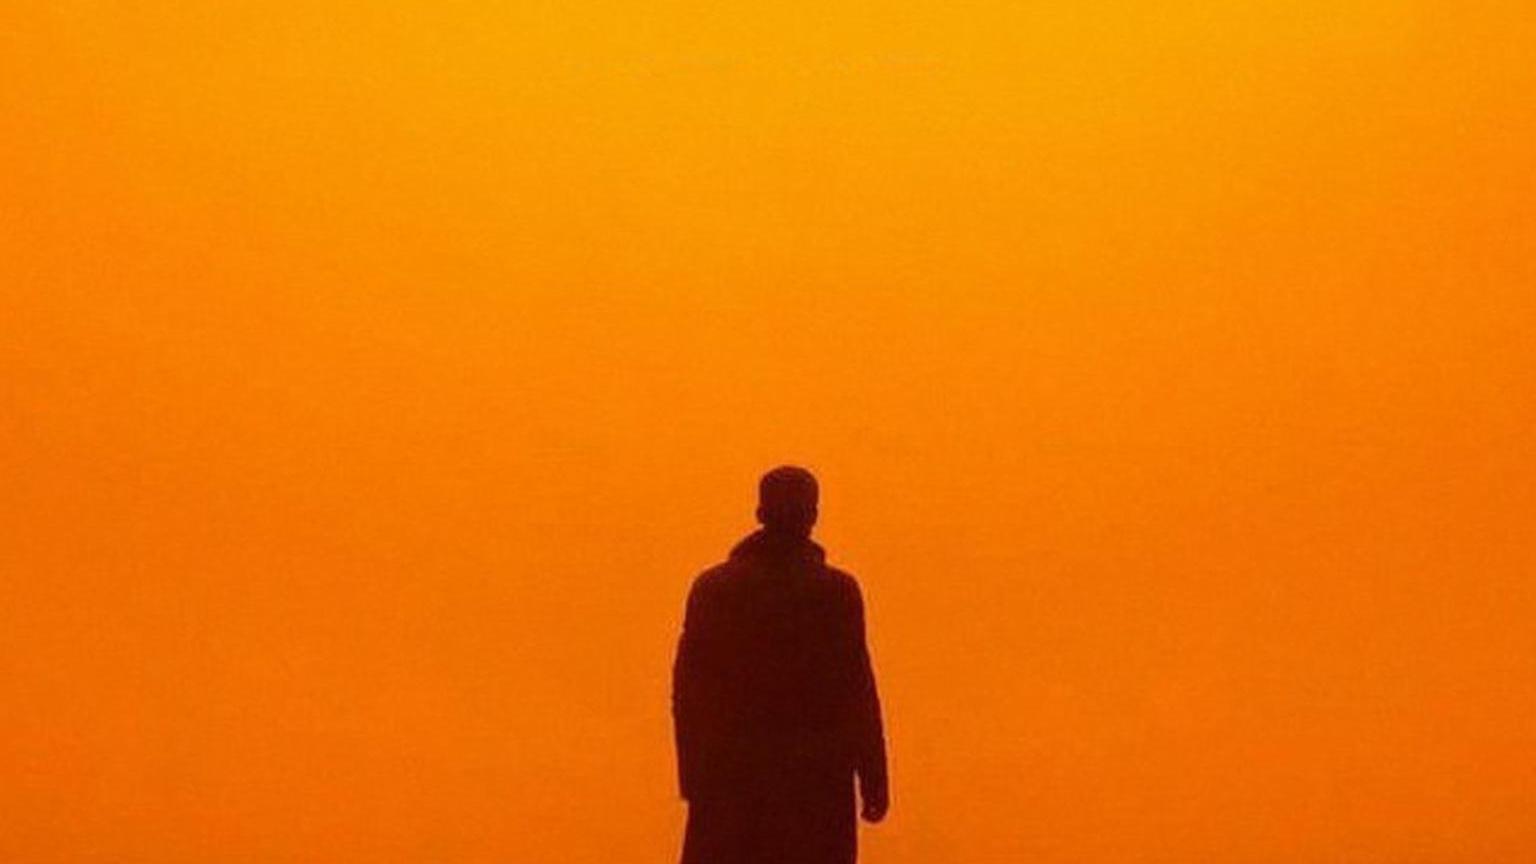 Free Download Blade Runner 2049 2017 Phone Wallpaper Moviemania